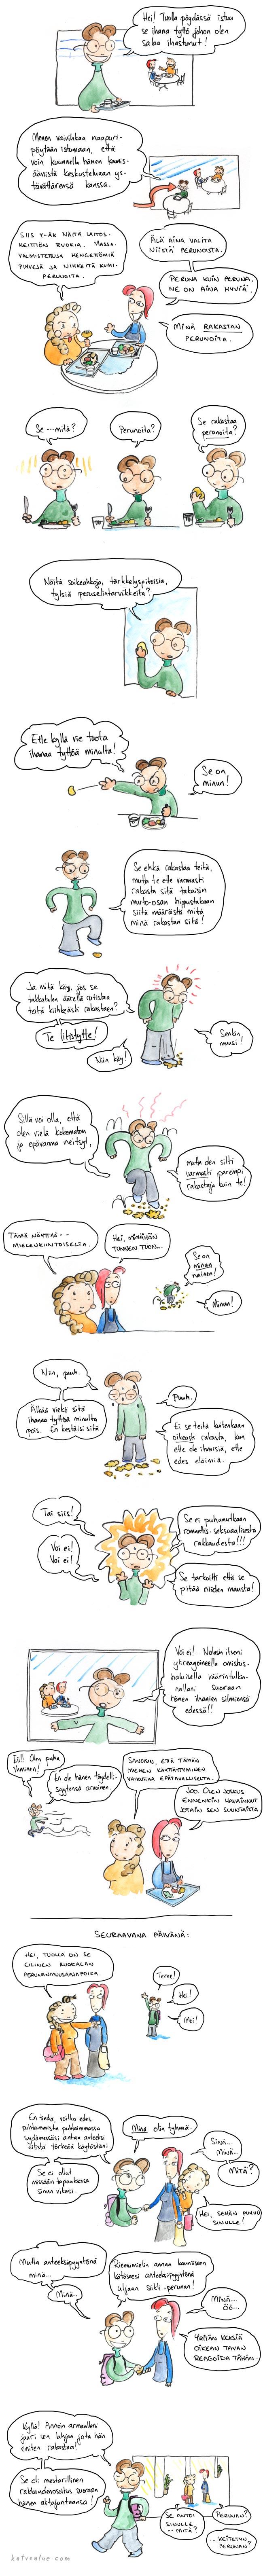 Rakkaus perunoihin